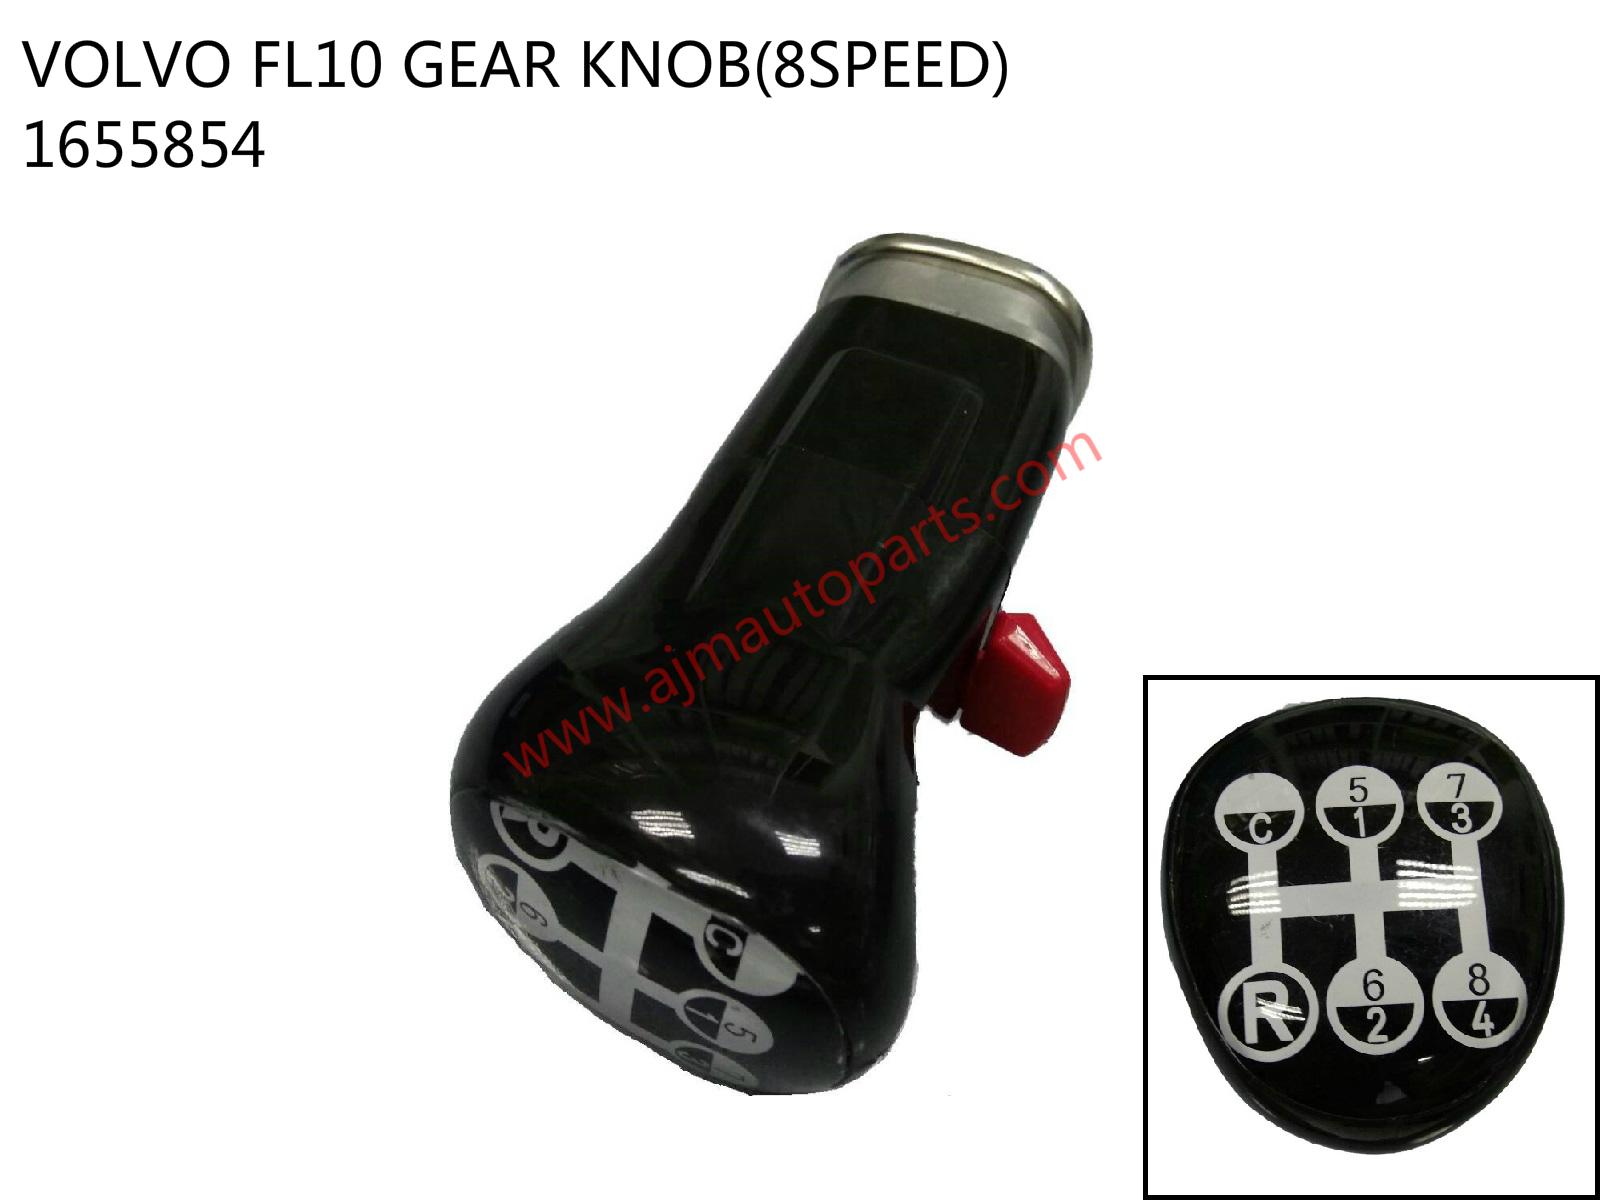 VOLVO FL10 GEAR KNOB(8SPEED)-1655854